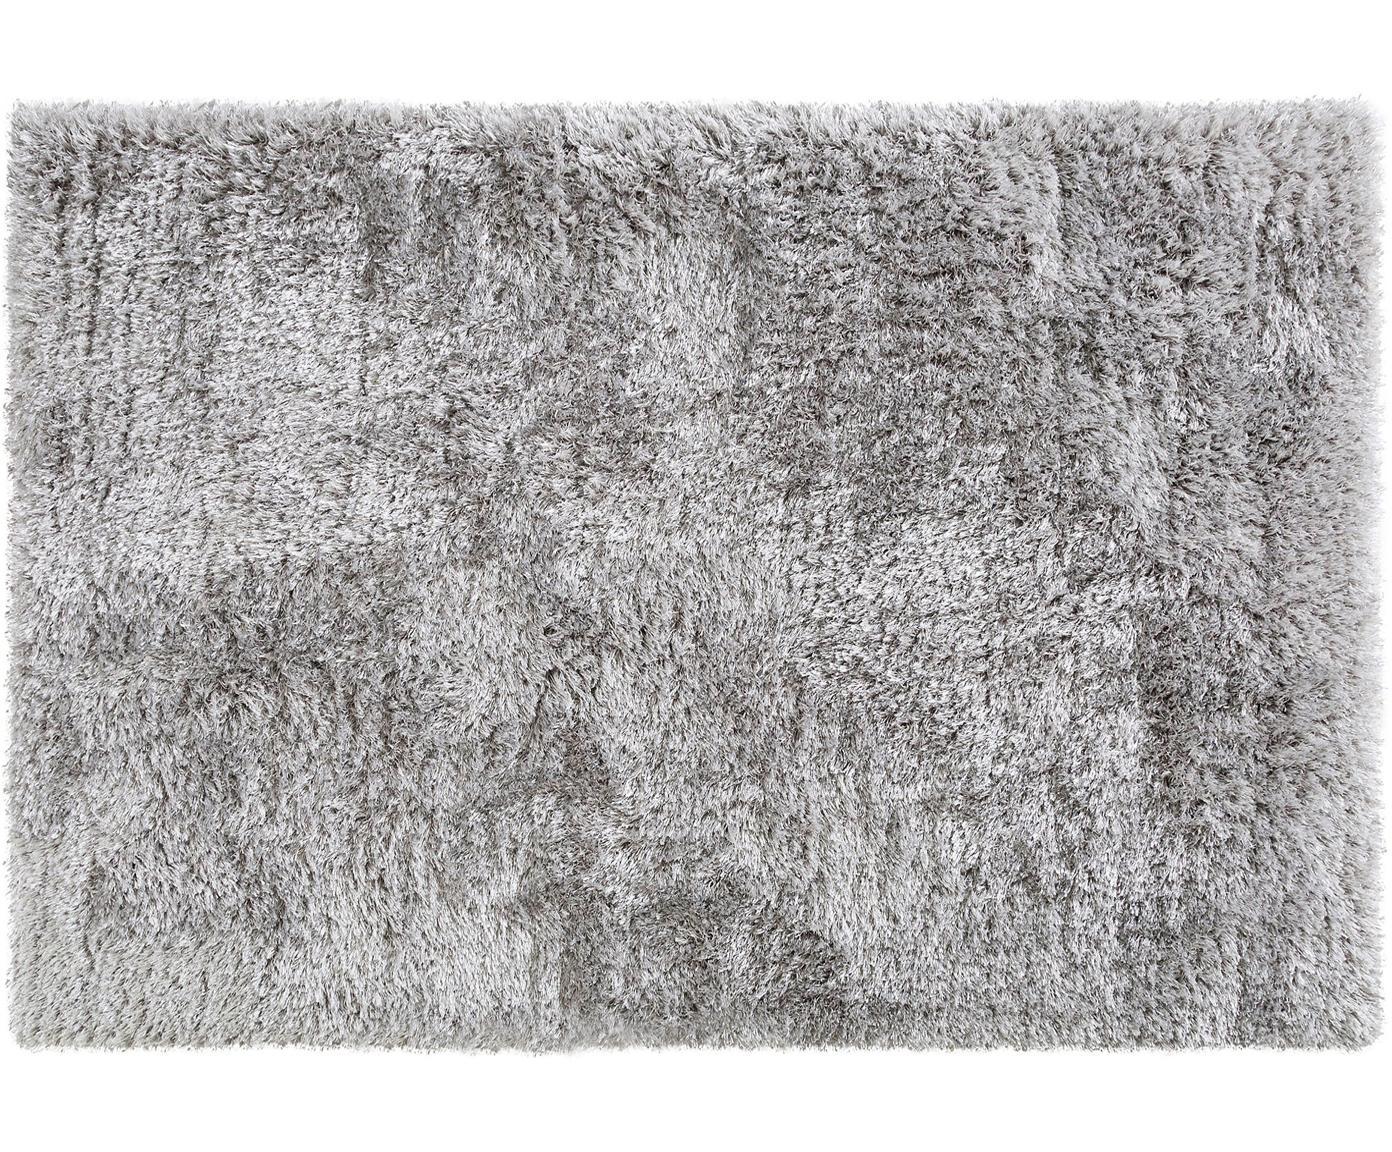 Glänzender Hochflor-Teppich Lea in Hellgrau, 50% Polyester, 50% Polypropylen, Grau, B 140 x L 200 cm (Größe S)